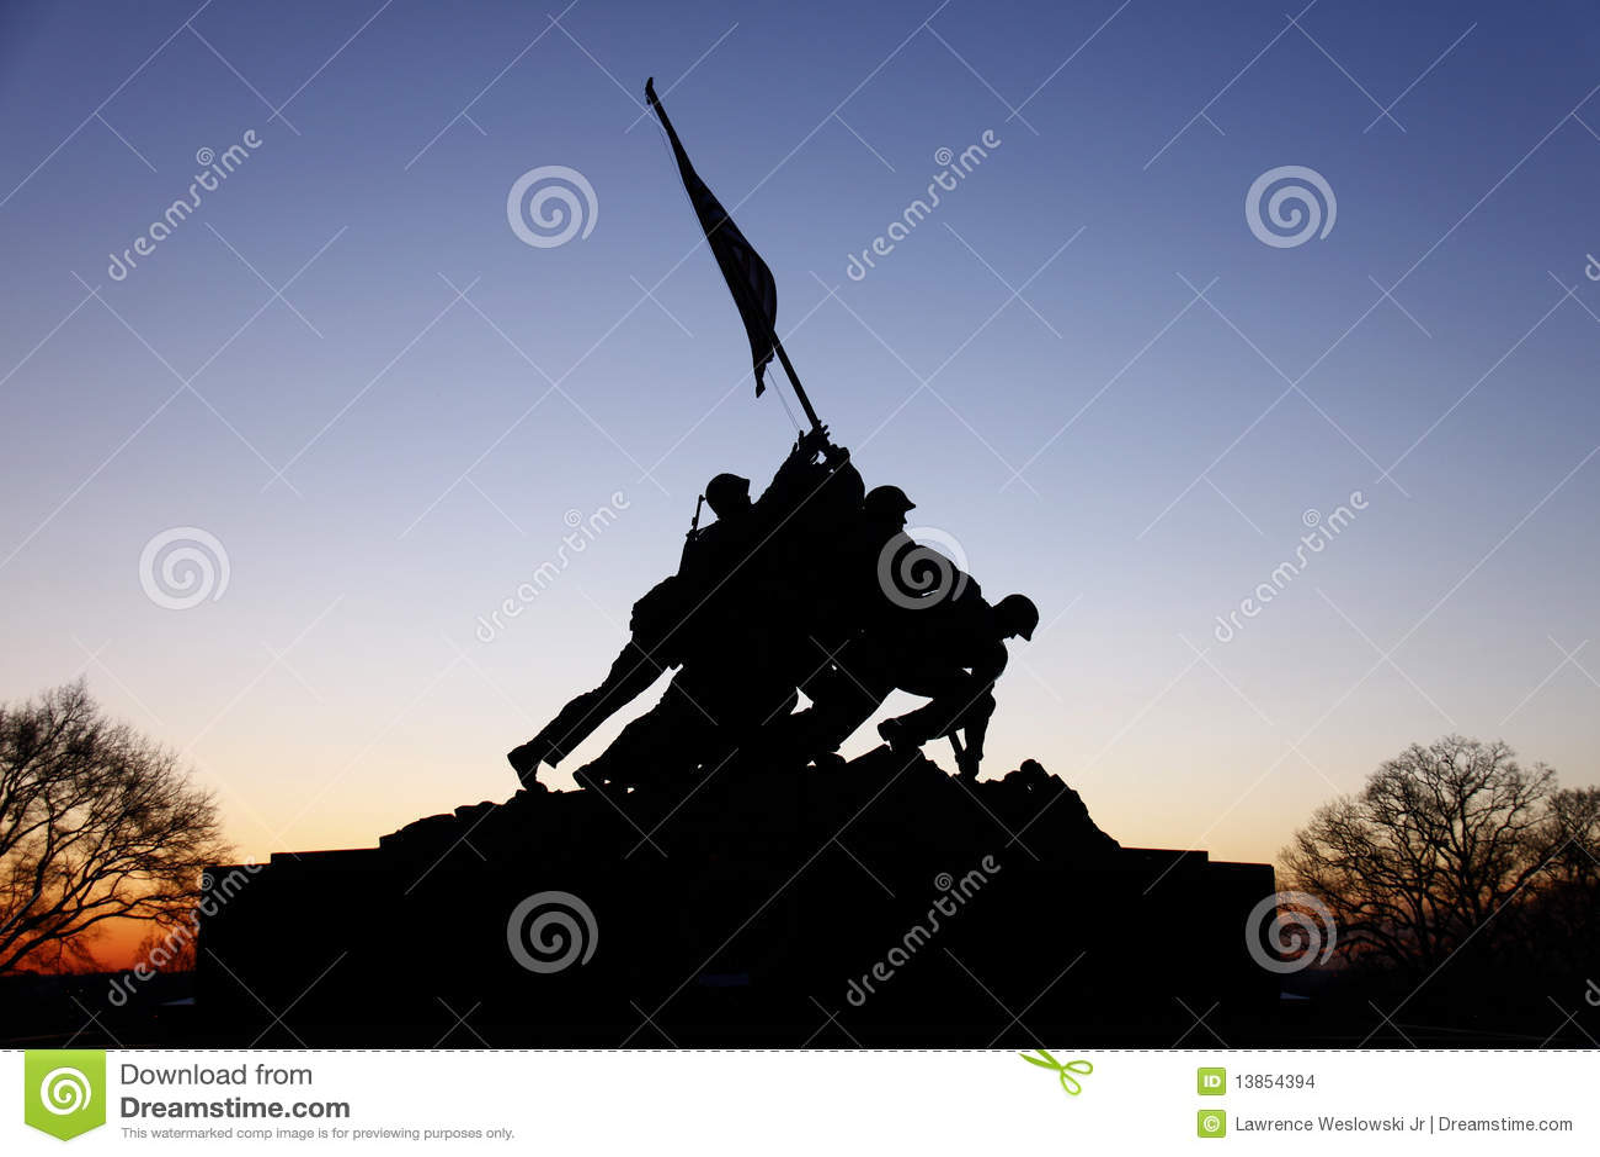 Iwo Jima Memorial Before Sunrise